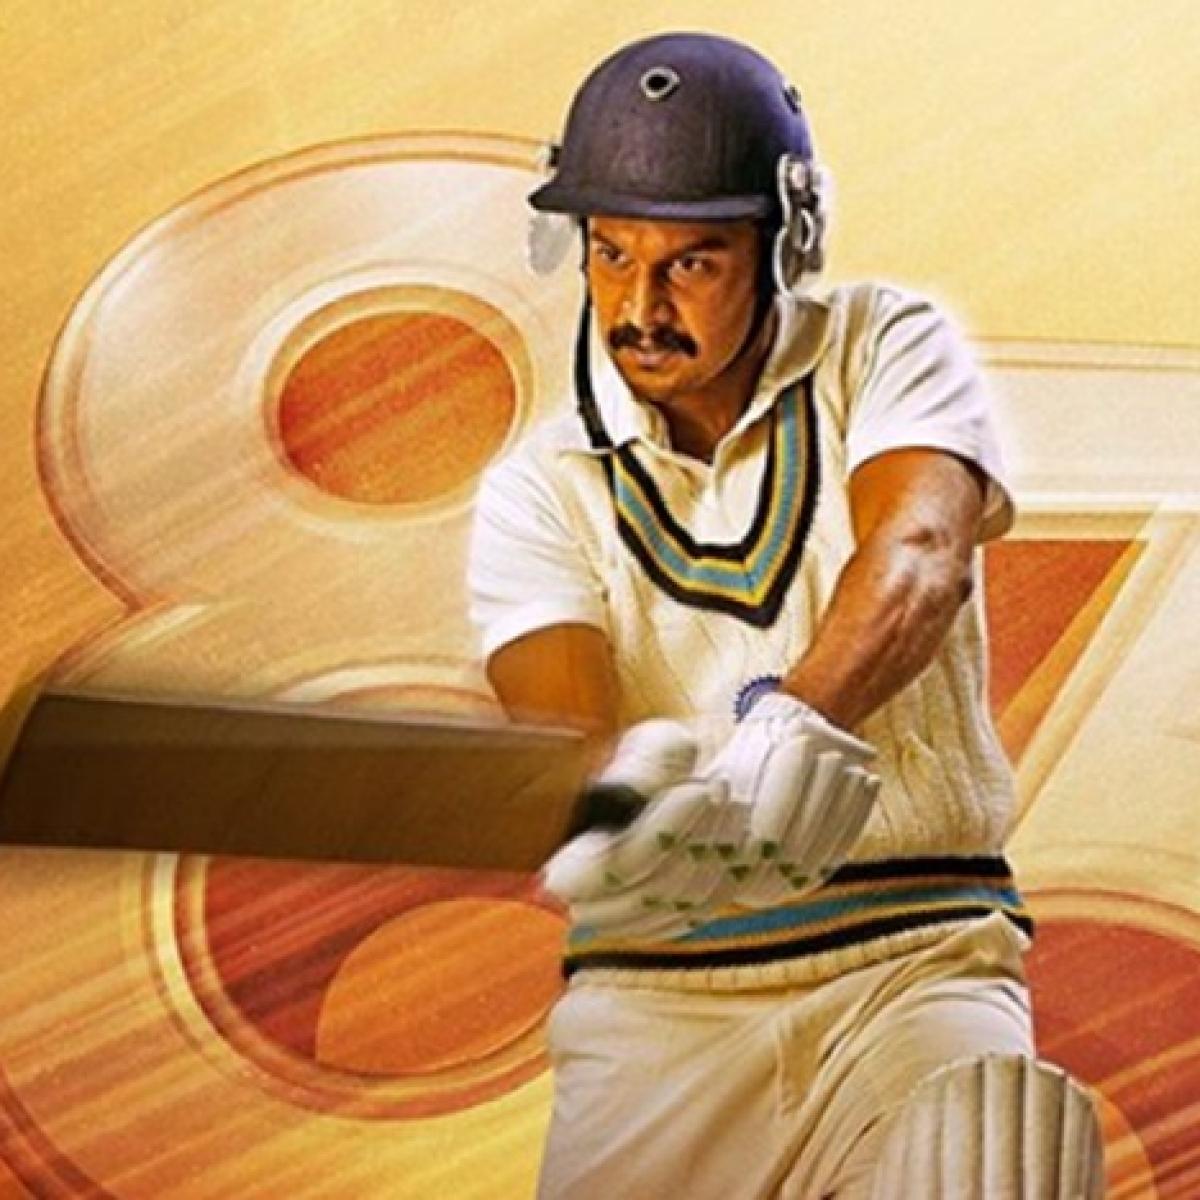 '83: Addinath M Kothare as Dilip Vengsarkar - man with the extraordinary batting skills